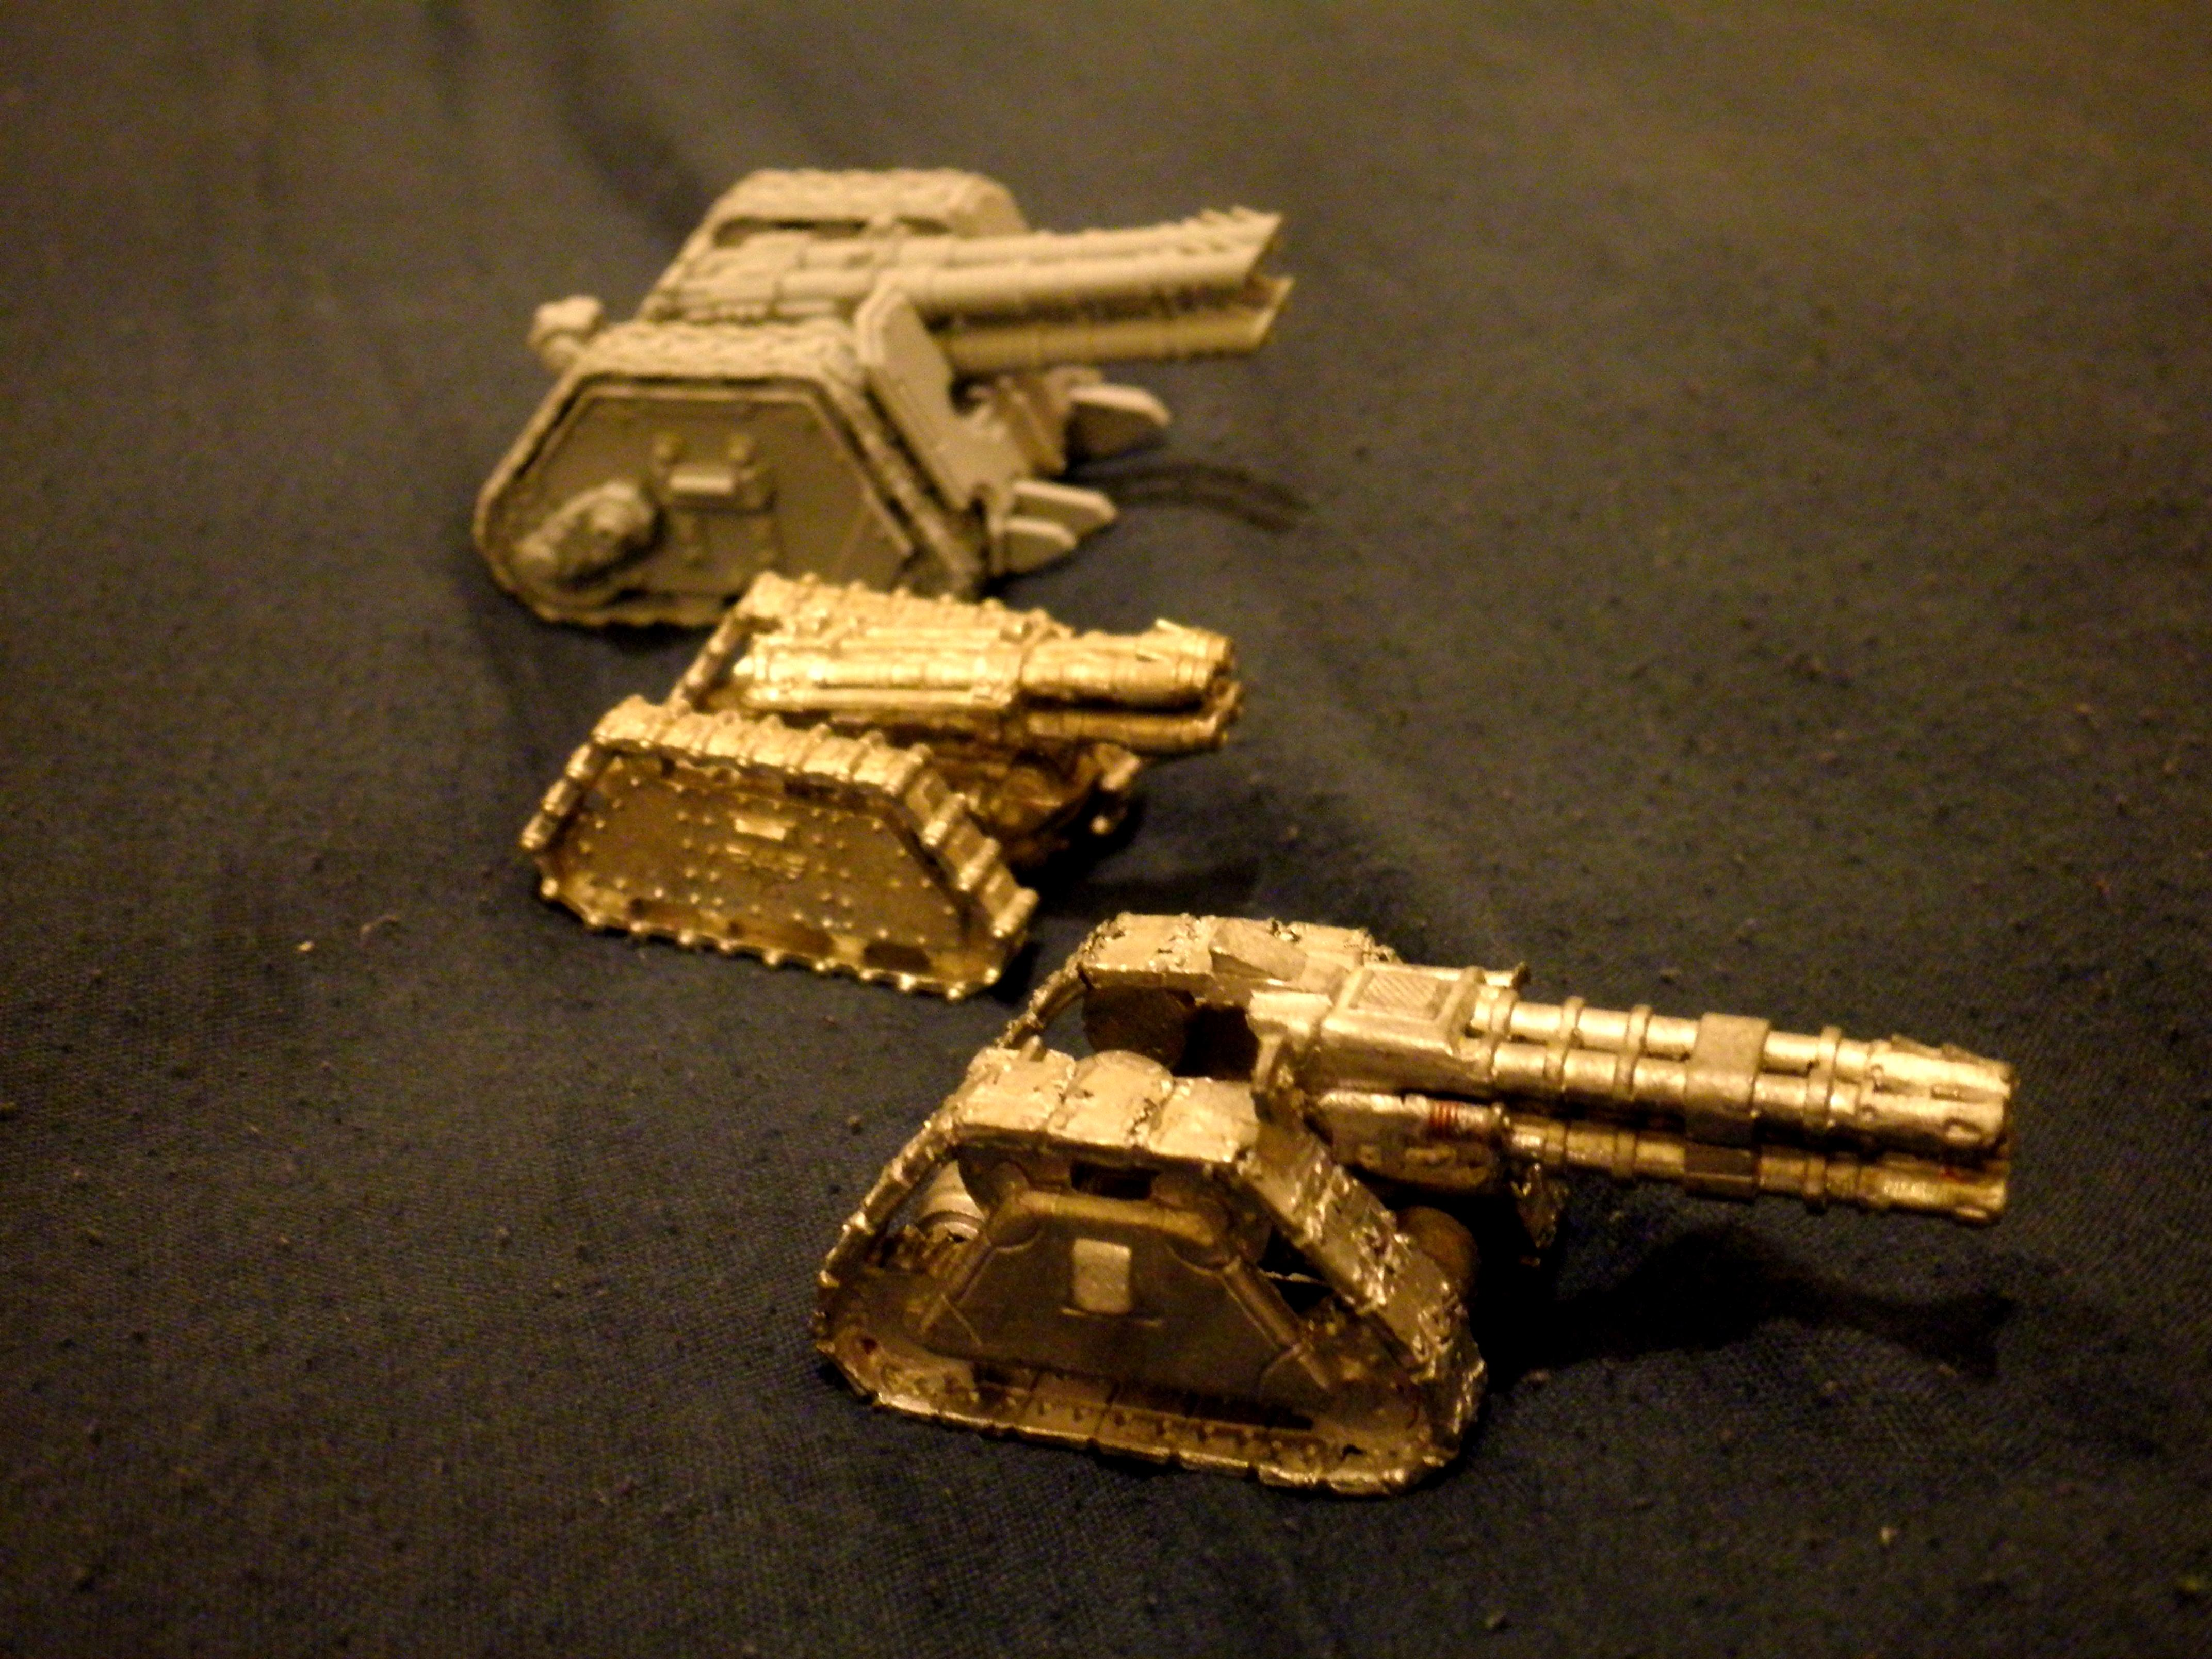 Artillery, Imperial Guard, Necromunda, Rapier, Rapier Laser Destroyer, Rogue Trader, Space Marines